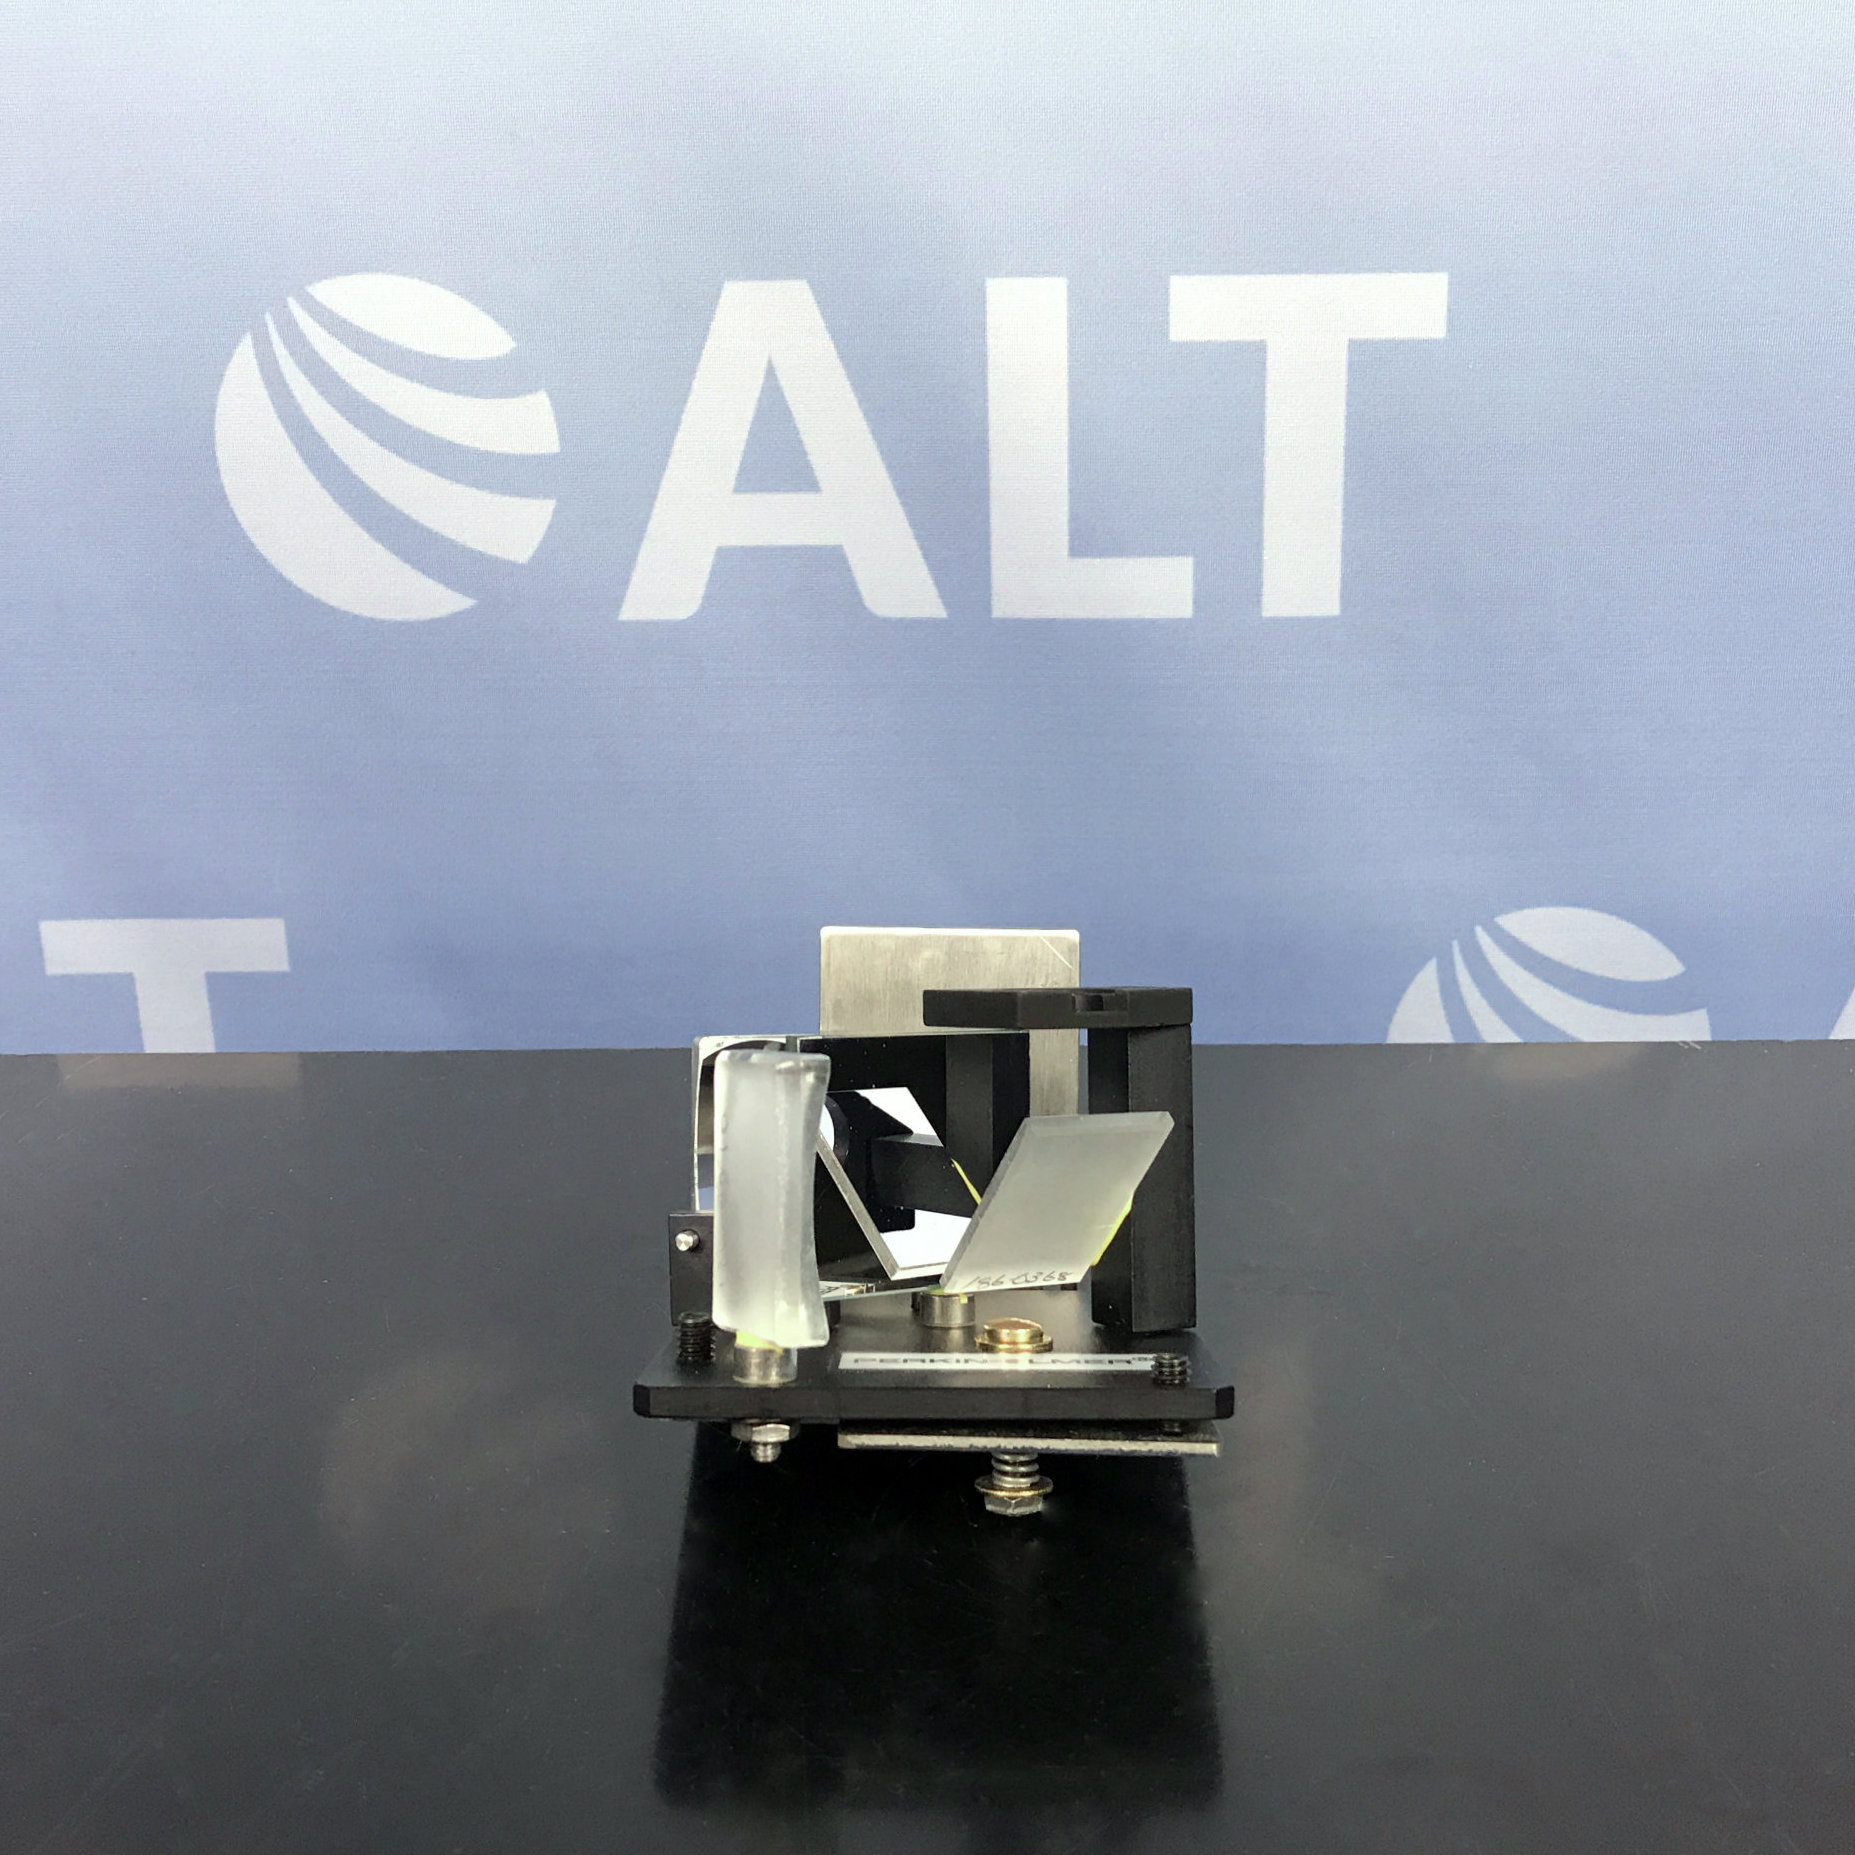 PerkinElmer  3X-Beam Condenser & Reflectance Accessory for IR Spectrophotometer Image